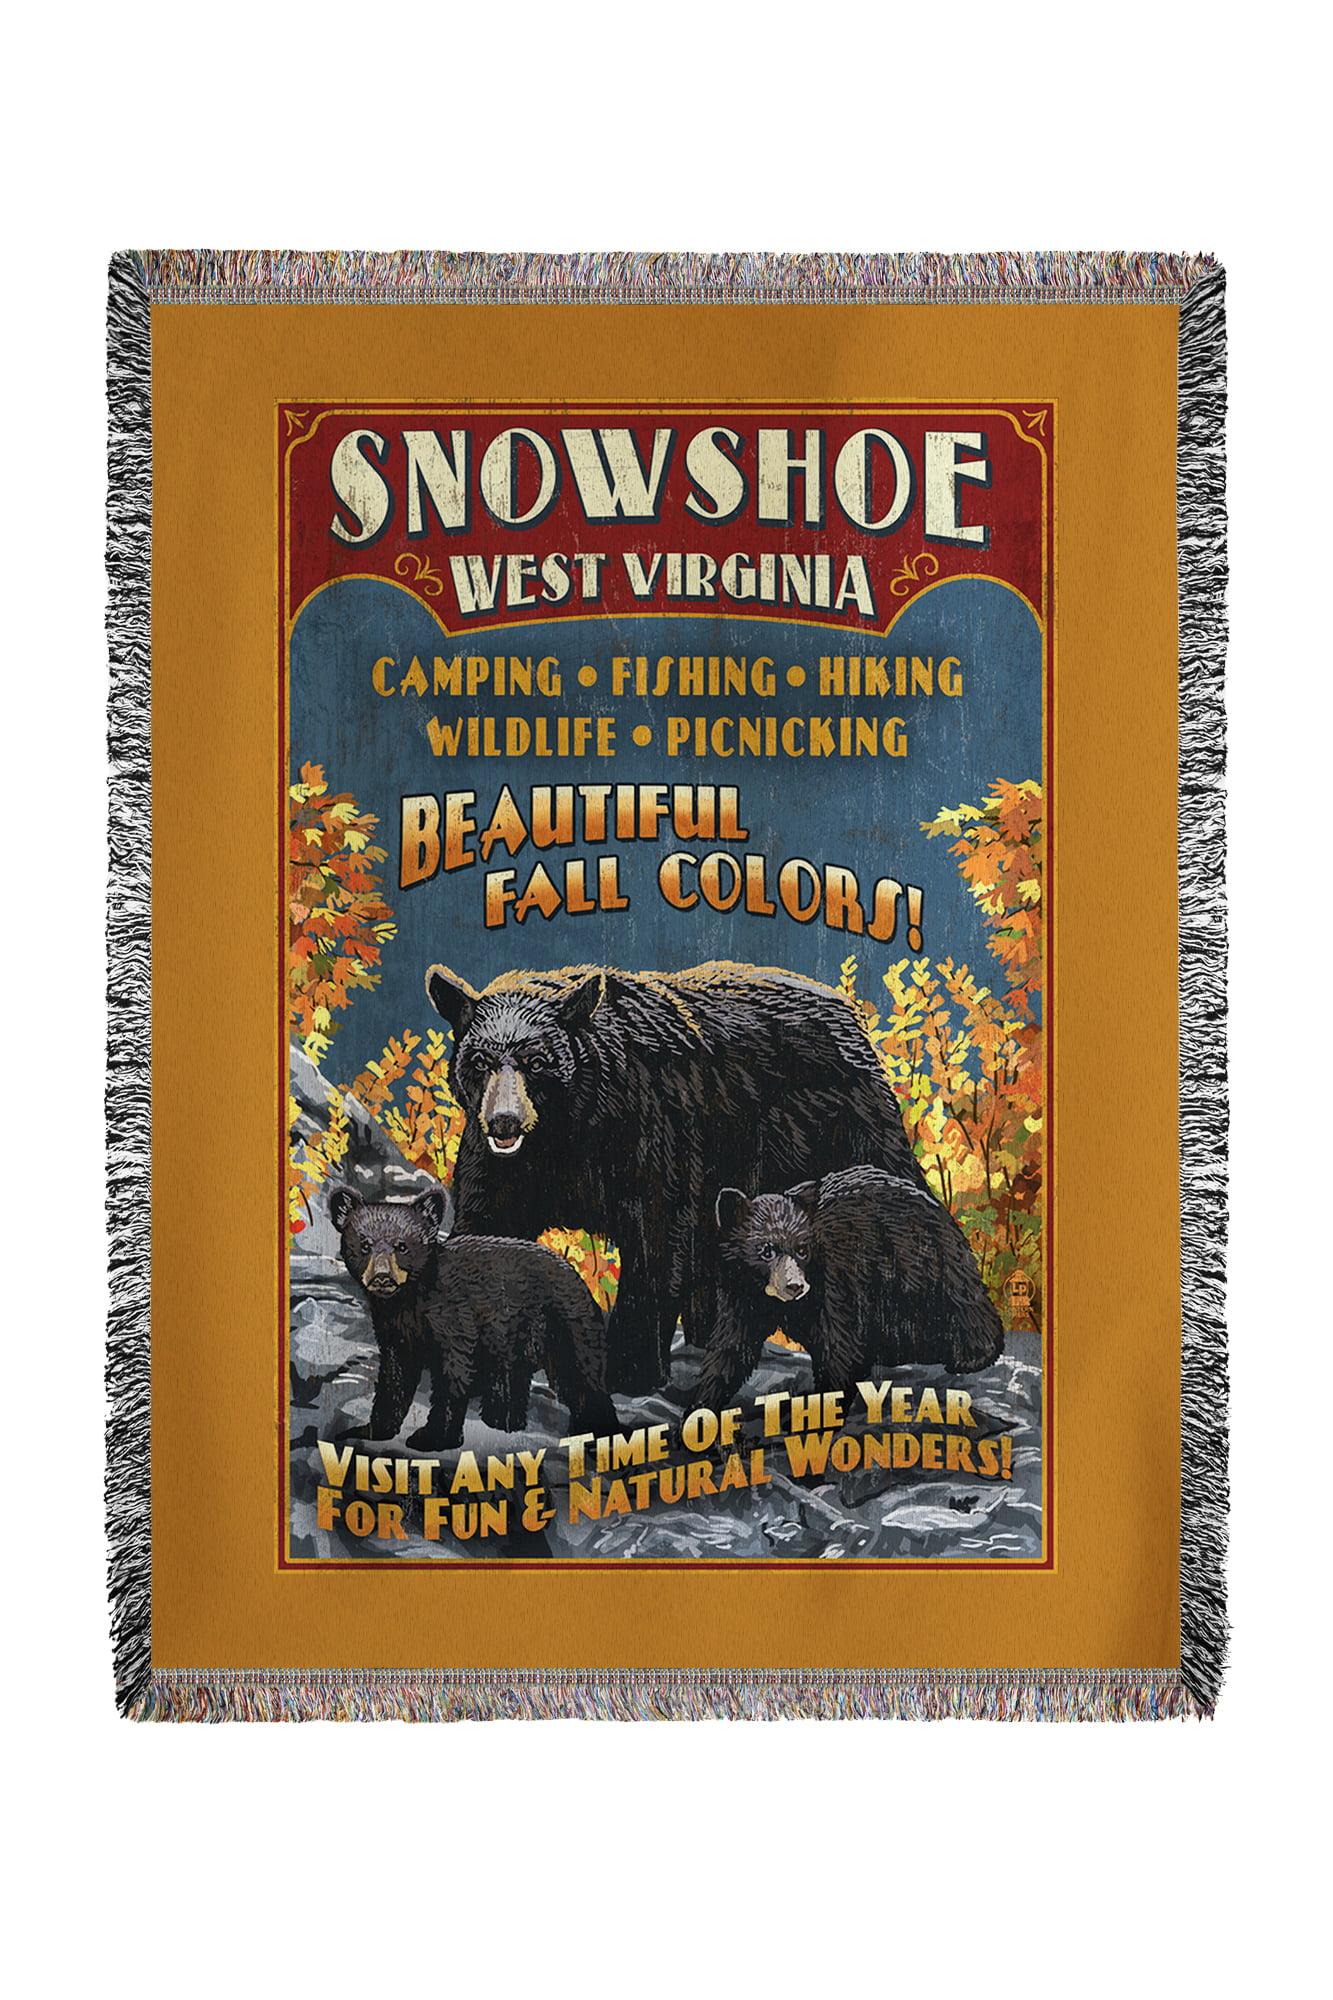 Snowshoe, West Virginia Black Bear Vintage Sign Lantern Press Poster (60x80 Woven Chenille Yarn Blanket) by Lantern Press